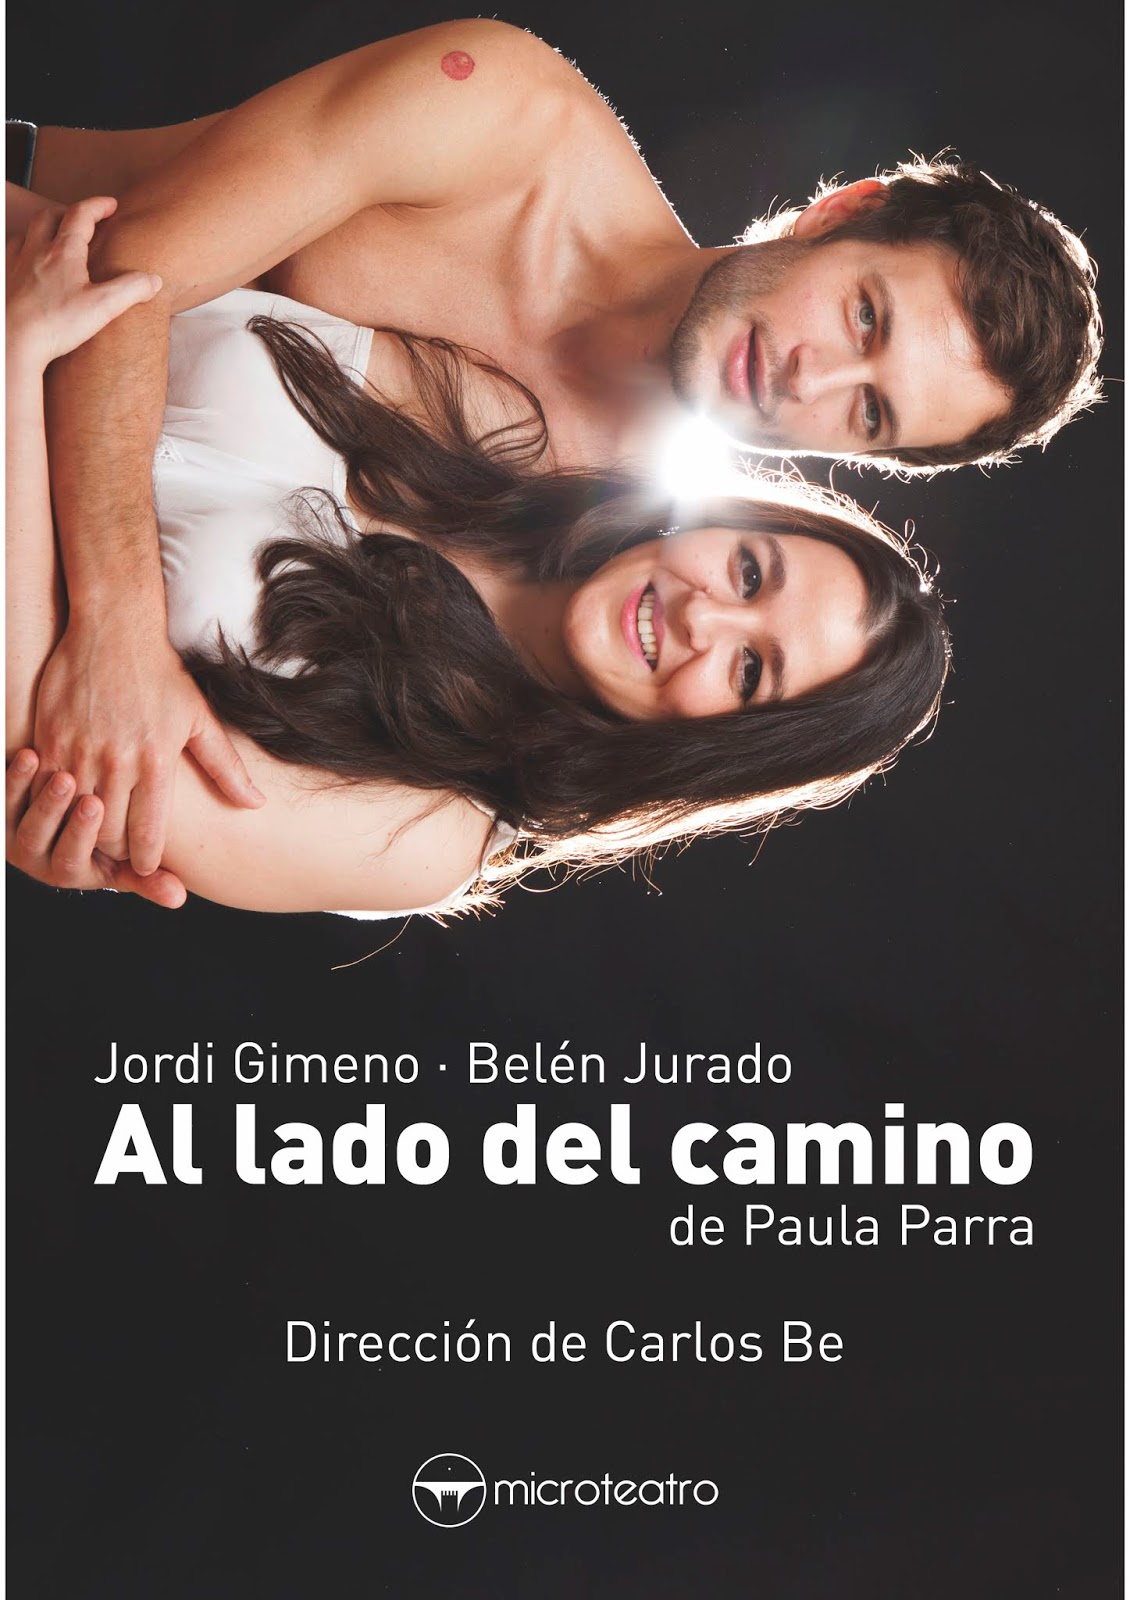 Al Lado del Camino Album - lyrics.com